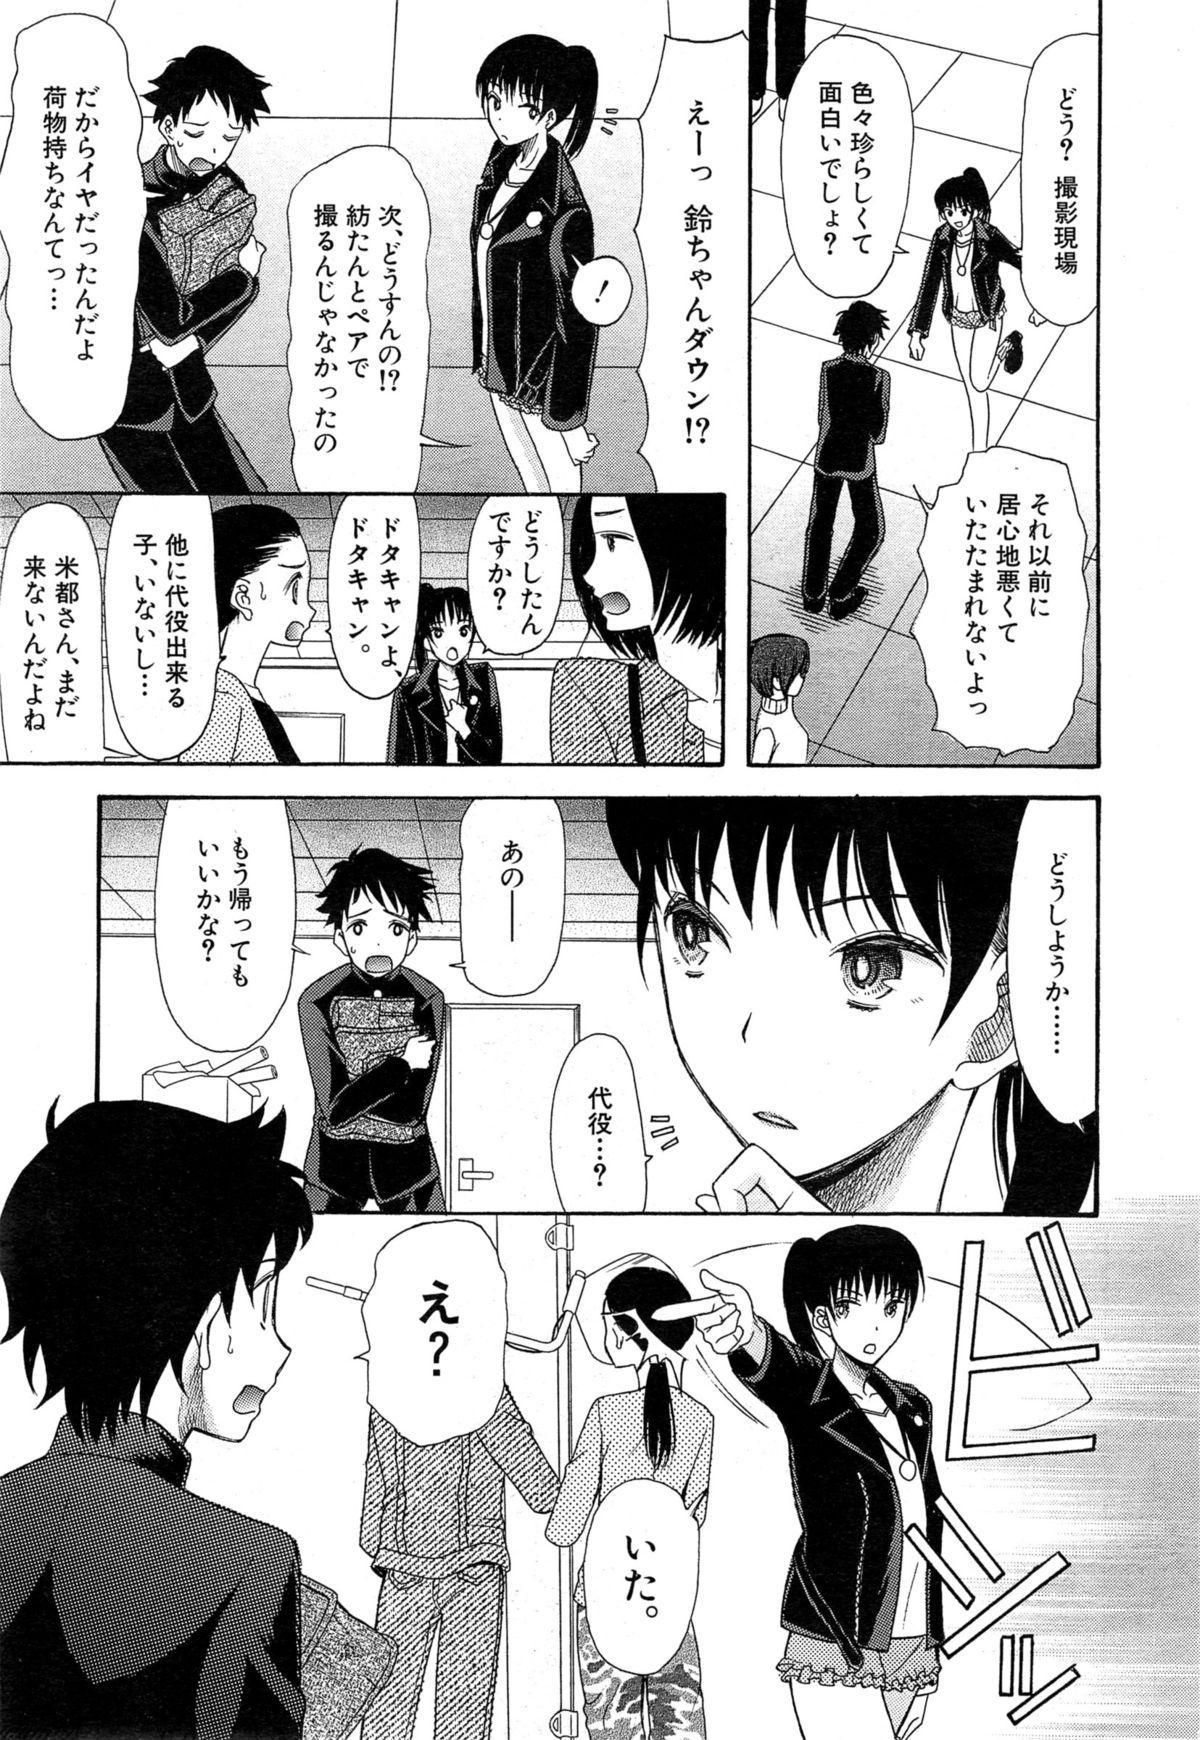 Kawaiku Natte Omocha ni Natte 62